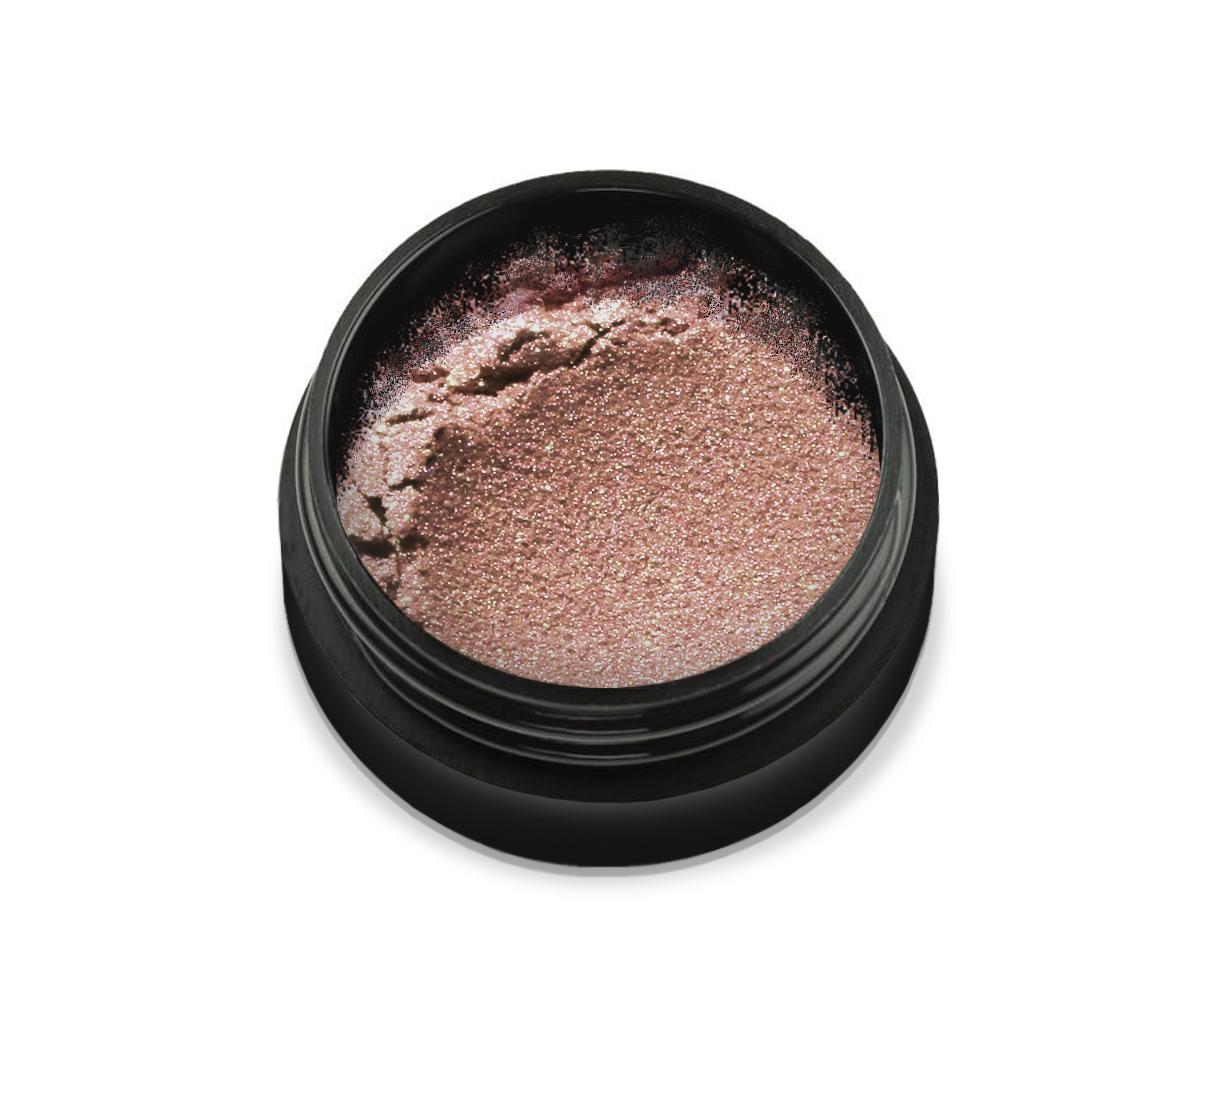 "6024 Pudra cu pigmenti 'Didier Lab"",pink 2,5g/Pigment powder 'Didier Lab"",pink"